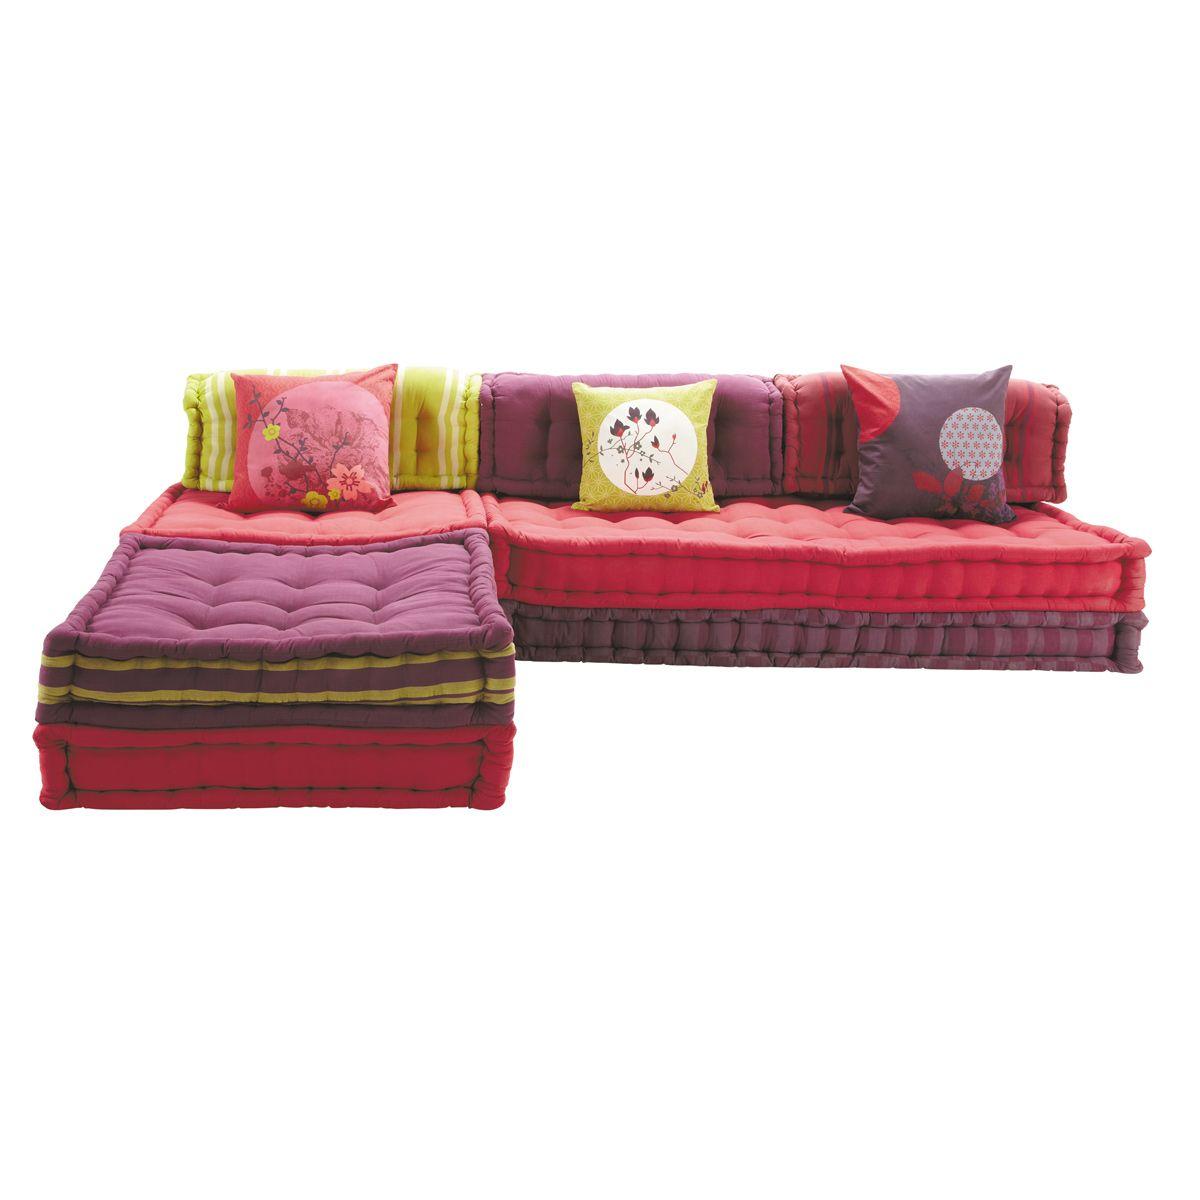 mah jong modular sofa preis wood in philippines yay interiors 43 lifestyle beauty fashion